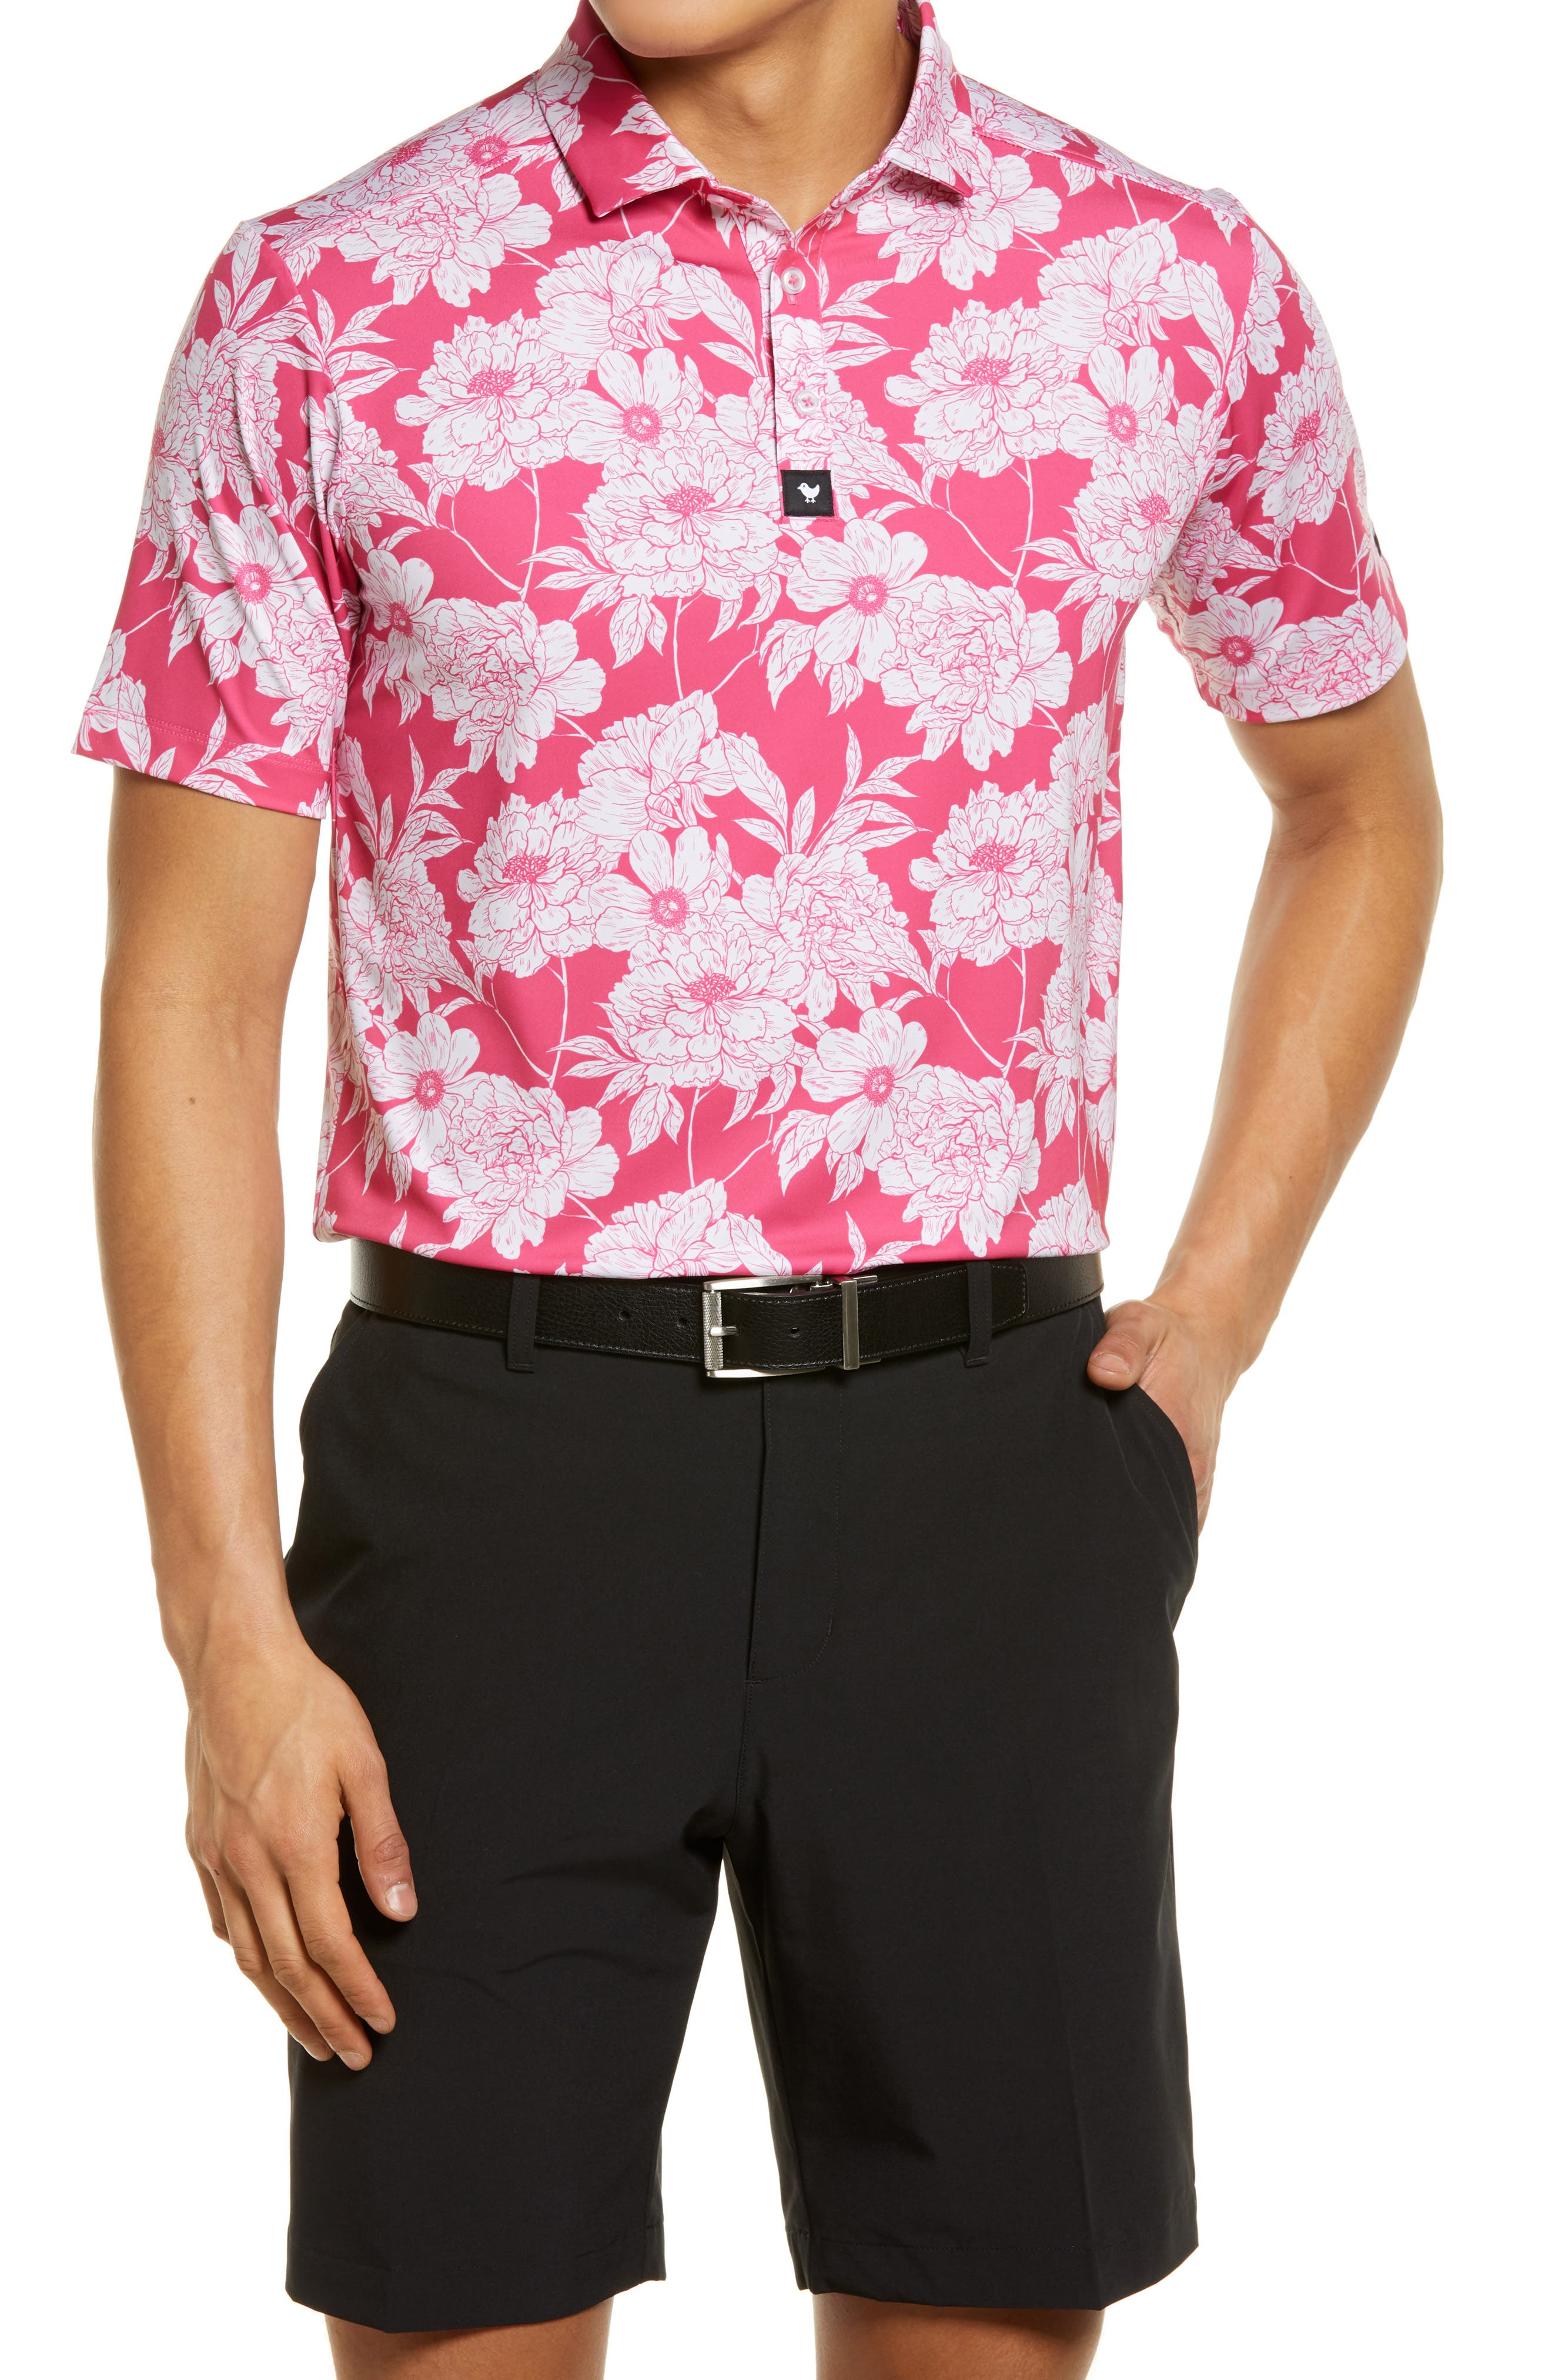 Lalaland Floral Short Sleeve Polo